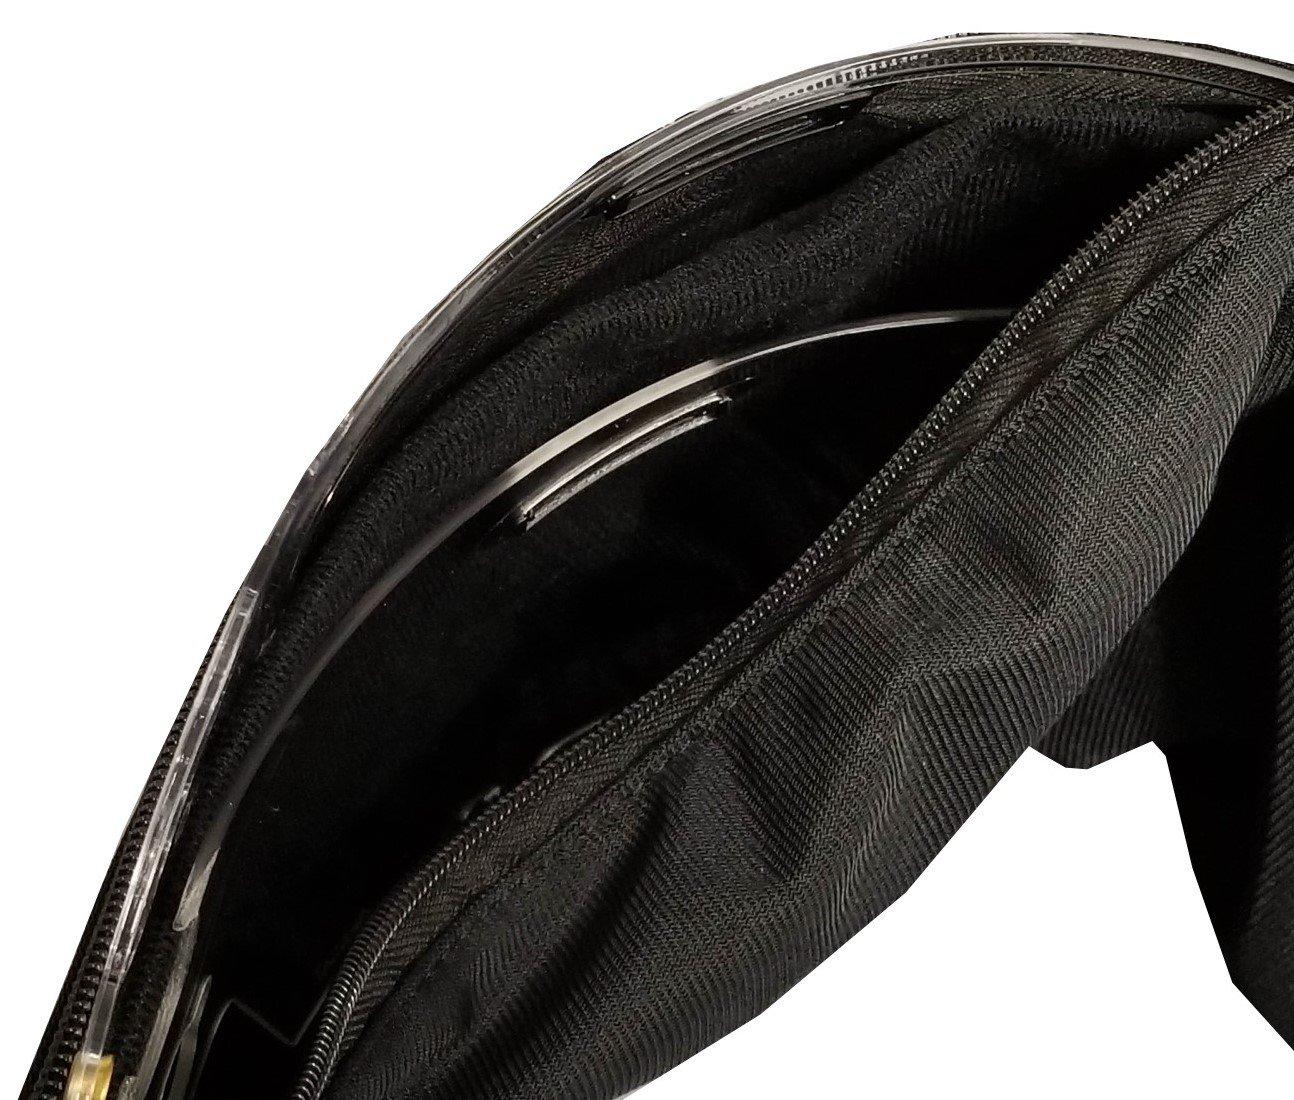 Deluxe Motorsport Helmet Face Shield Bag - Durable Material Motorcycle Helmet Visor Bag - Heavy Duty Zippered Motorbike Visor Protective Faceshield Pouch